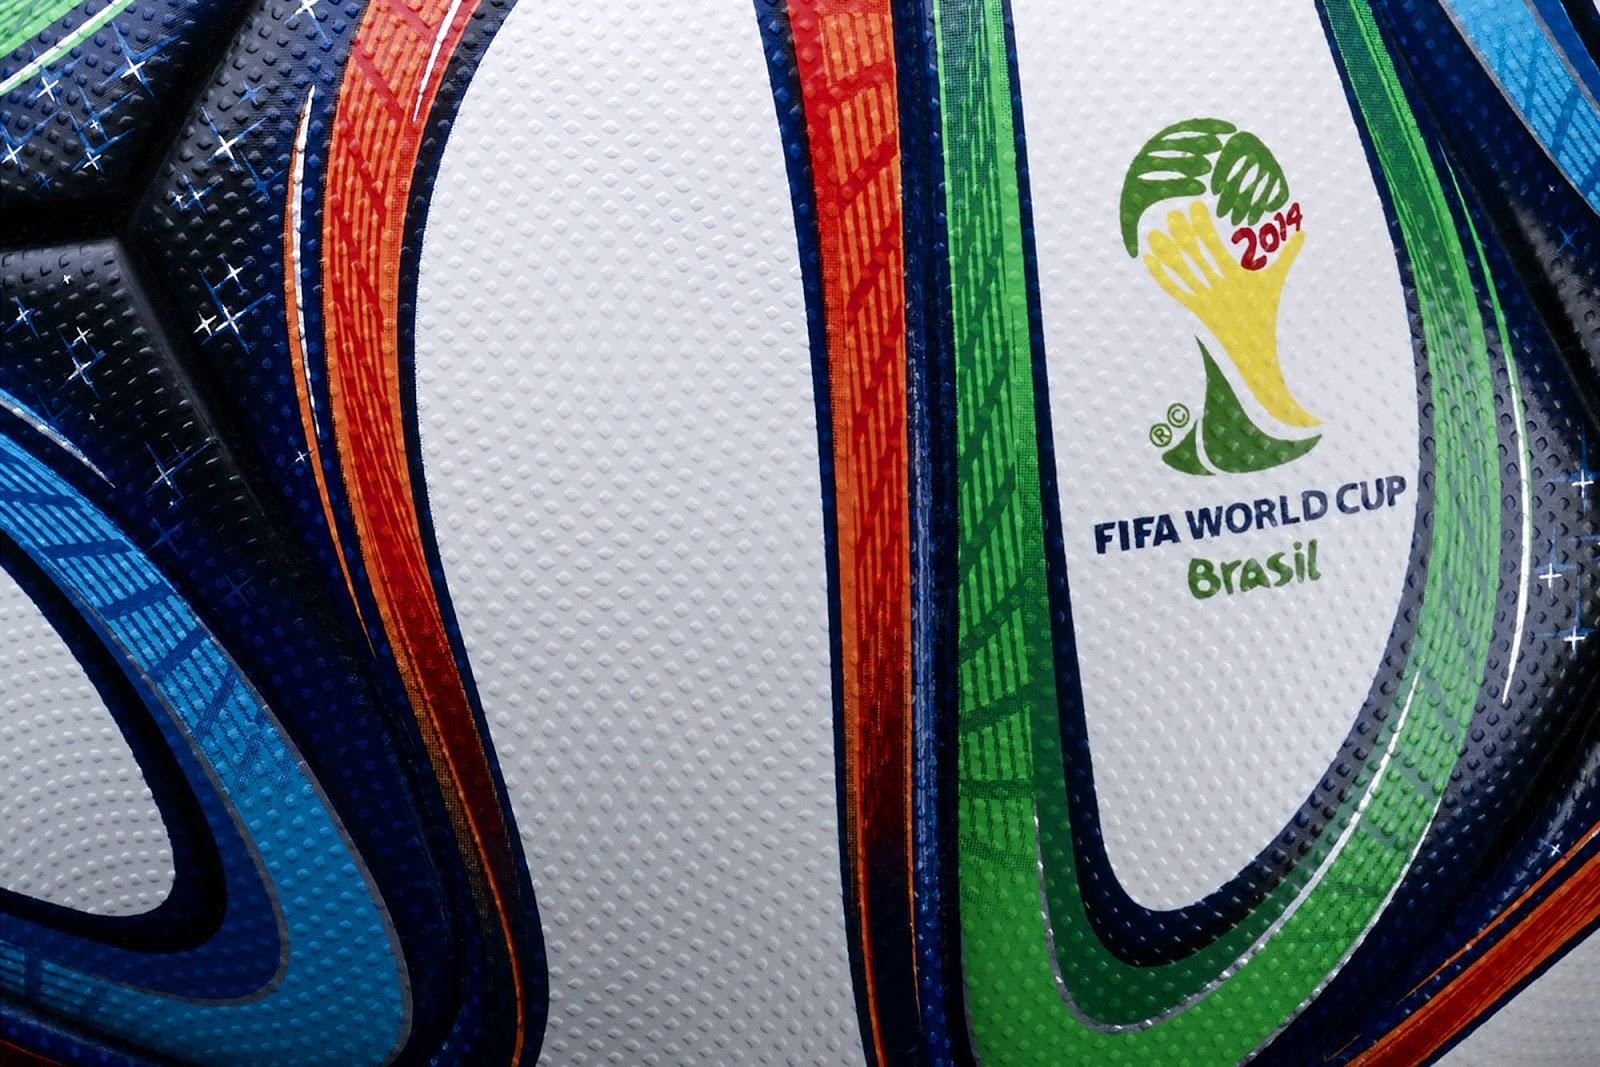 Adidas-Brazuca-World-Cup-Ball-wallpaper-wp3402178